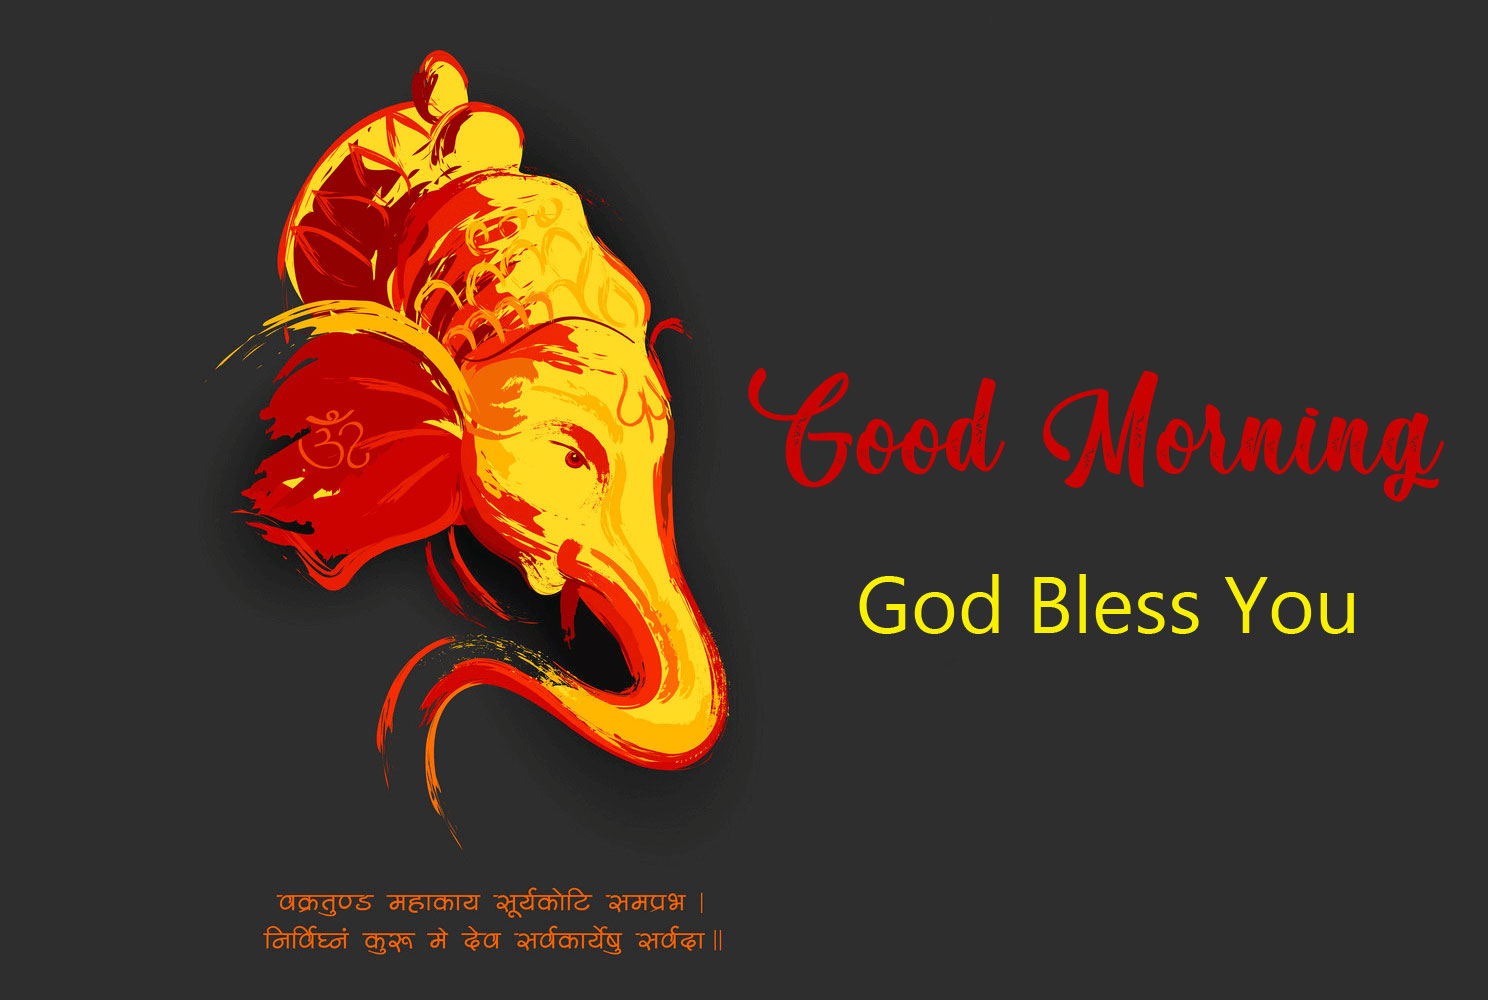 ganesha good morning images hd download